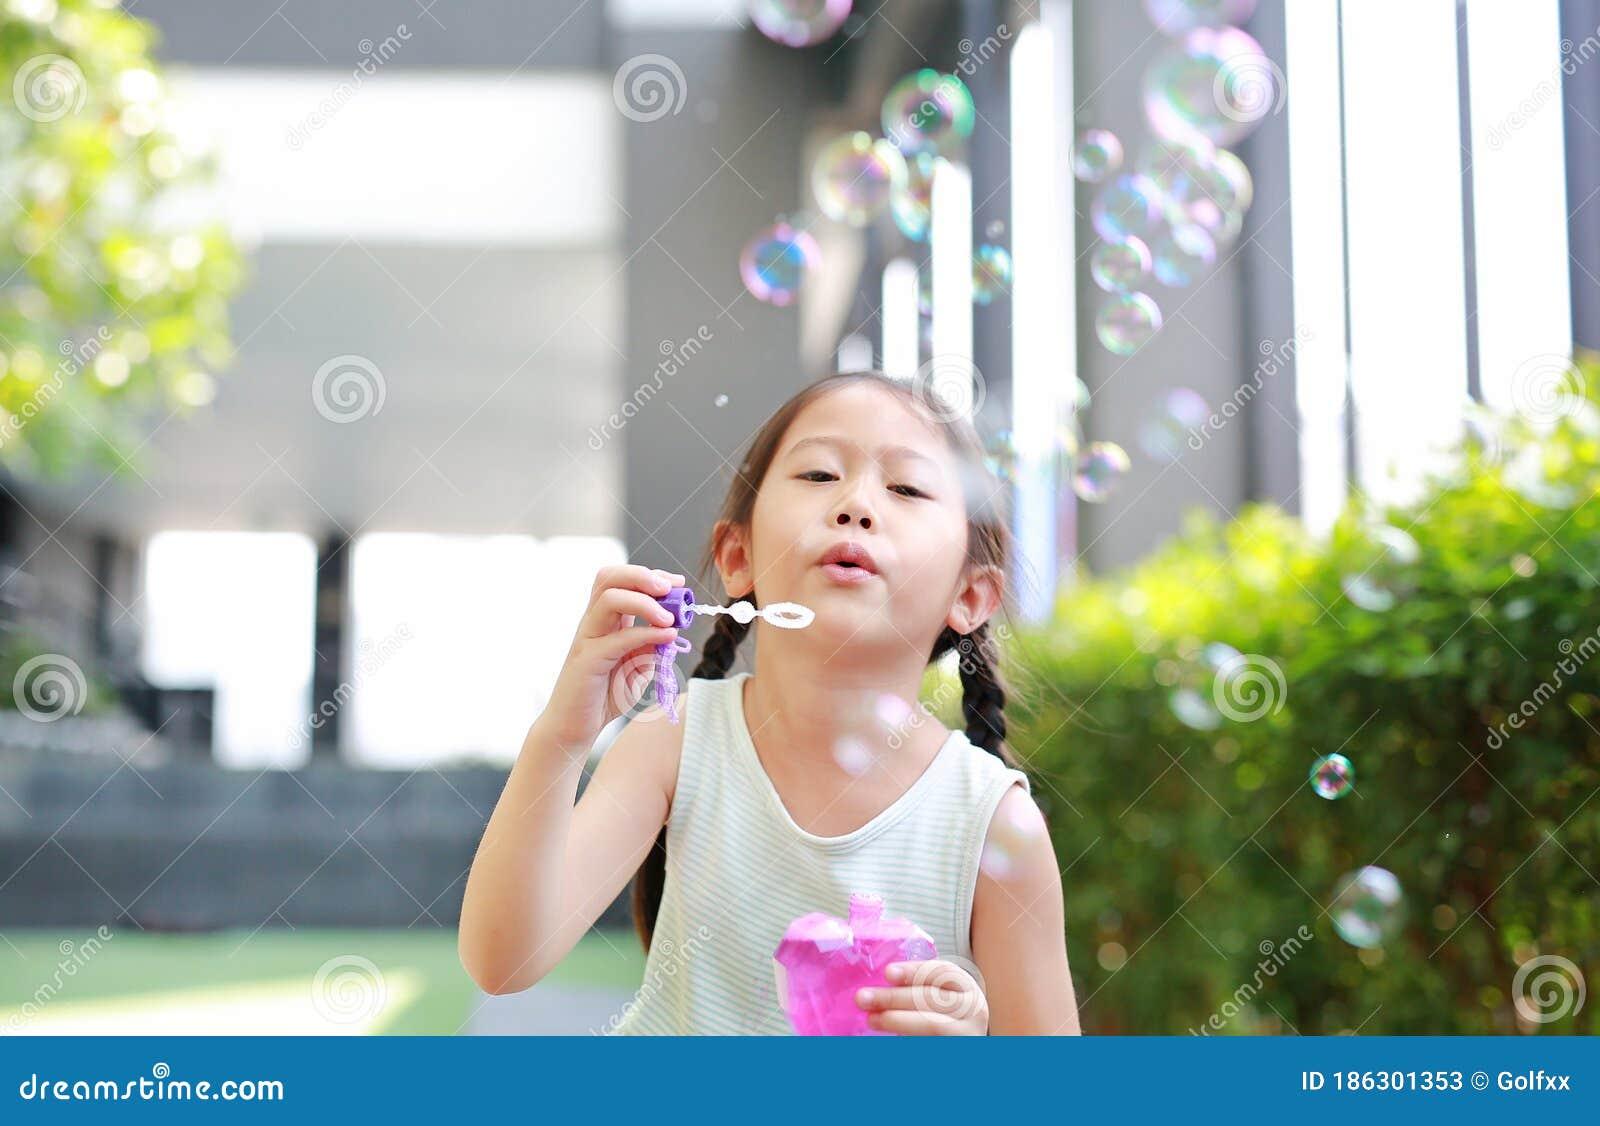 wanking asian Bubble outdoor